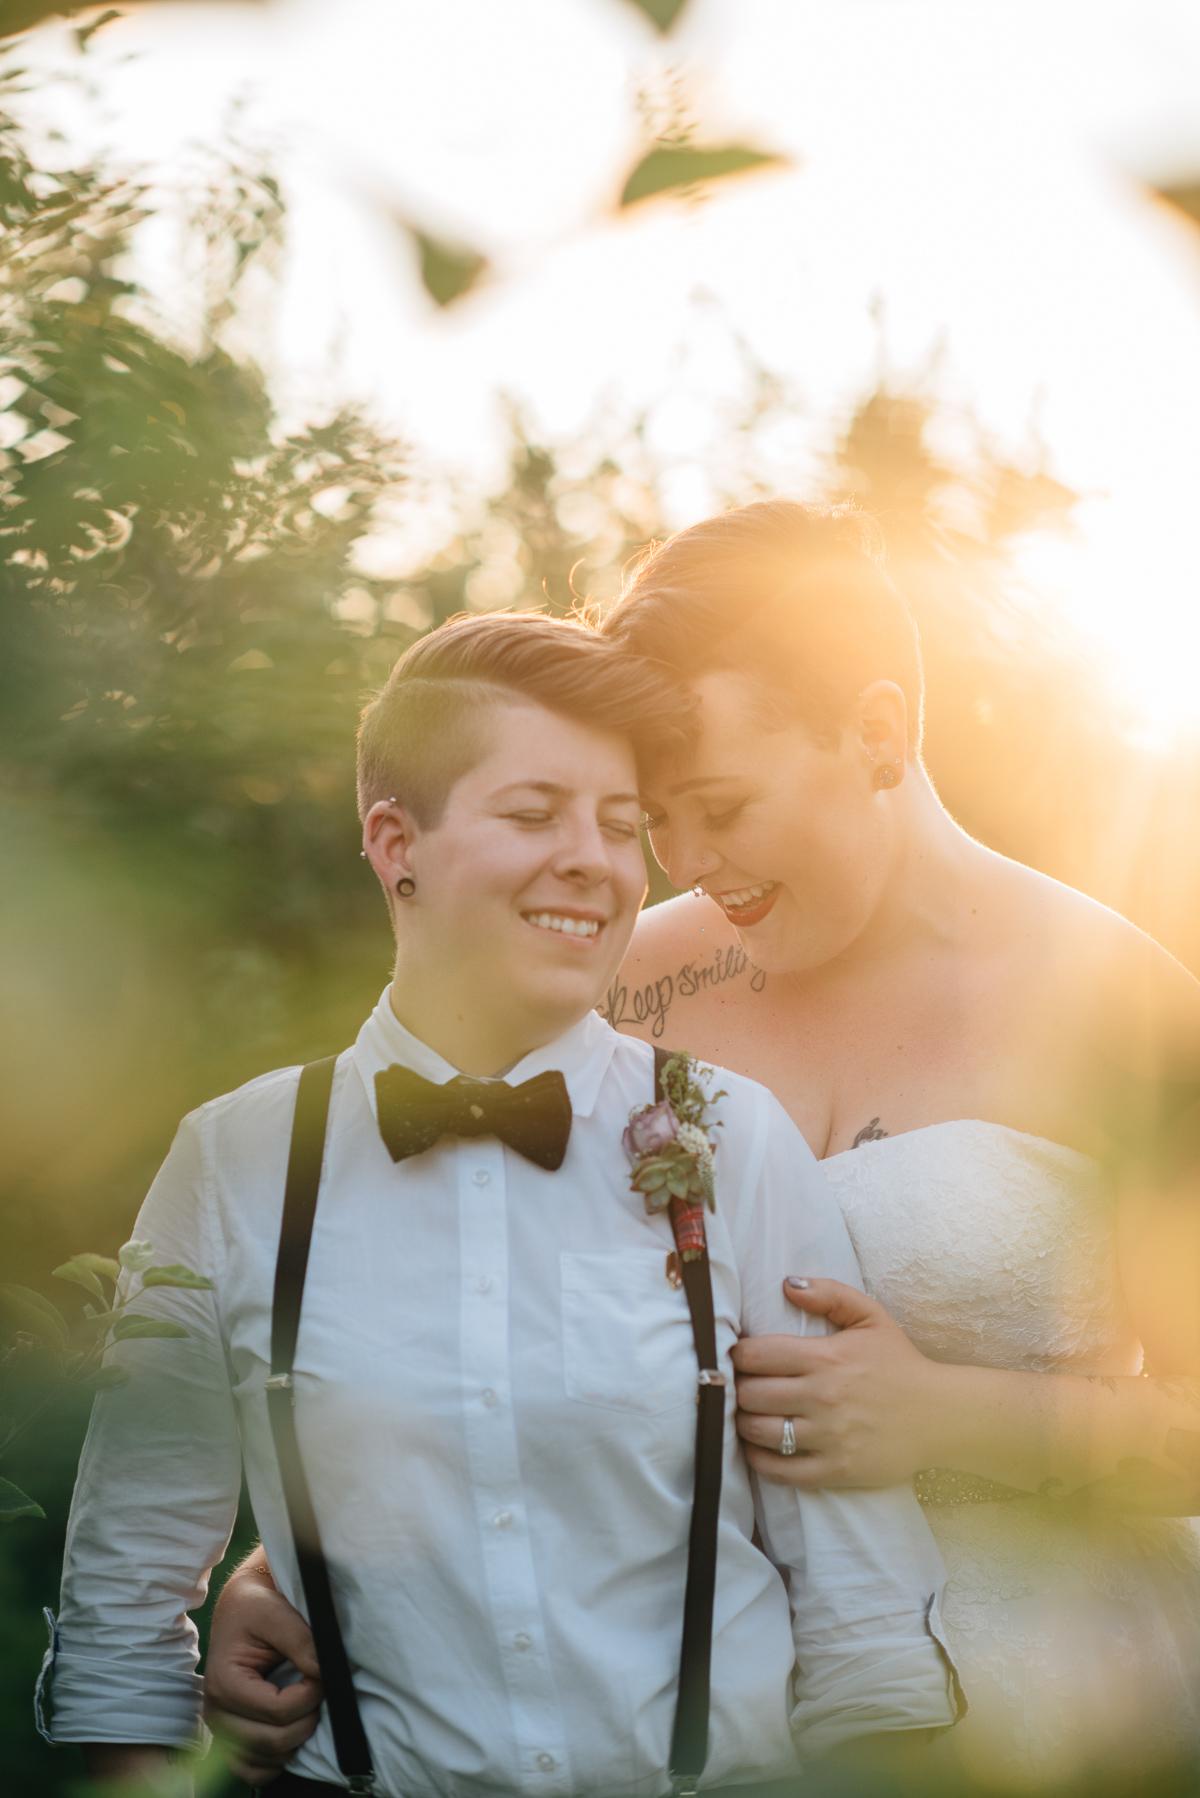 sara-wilde-photography-vineyard-bride-swish-list-beamer-falls-manor-grimsby-wedding-61.jpg